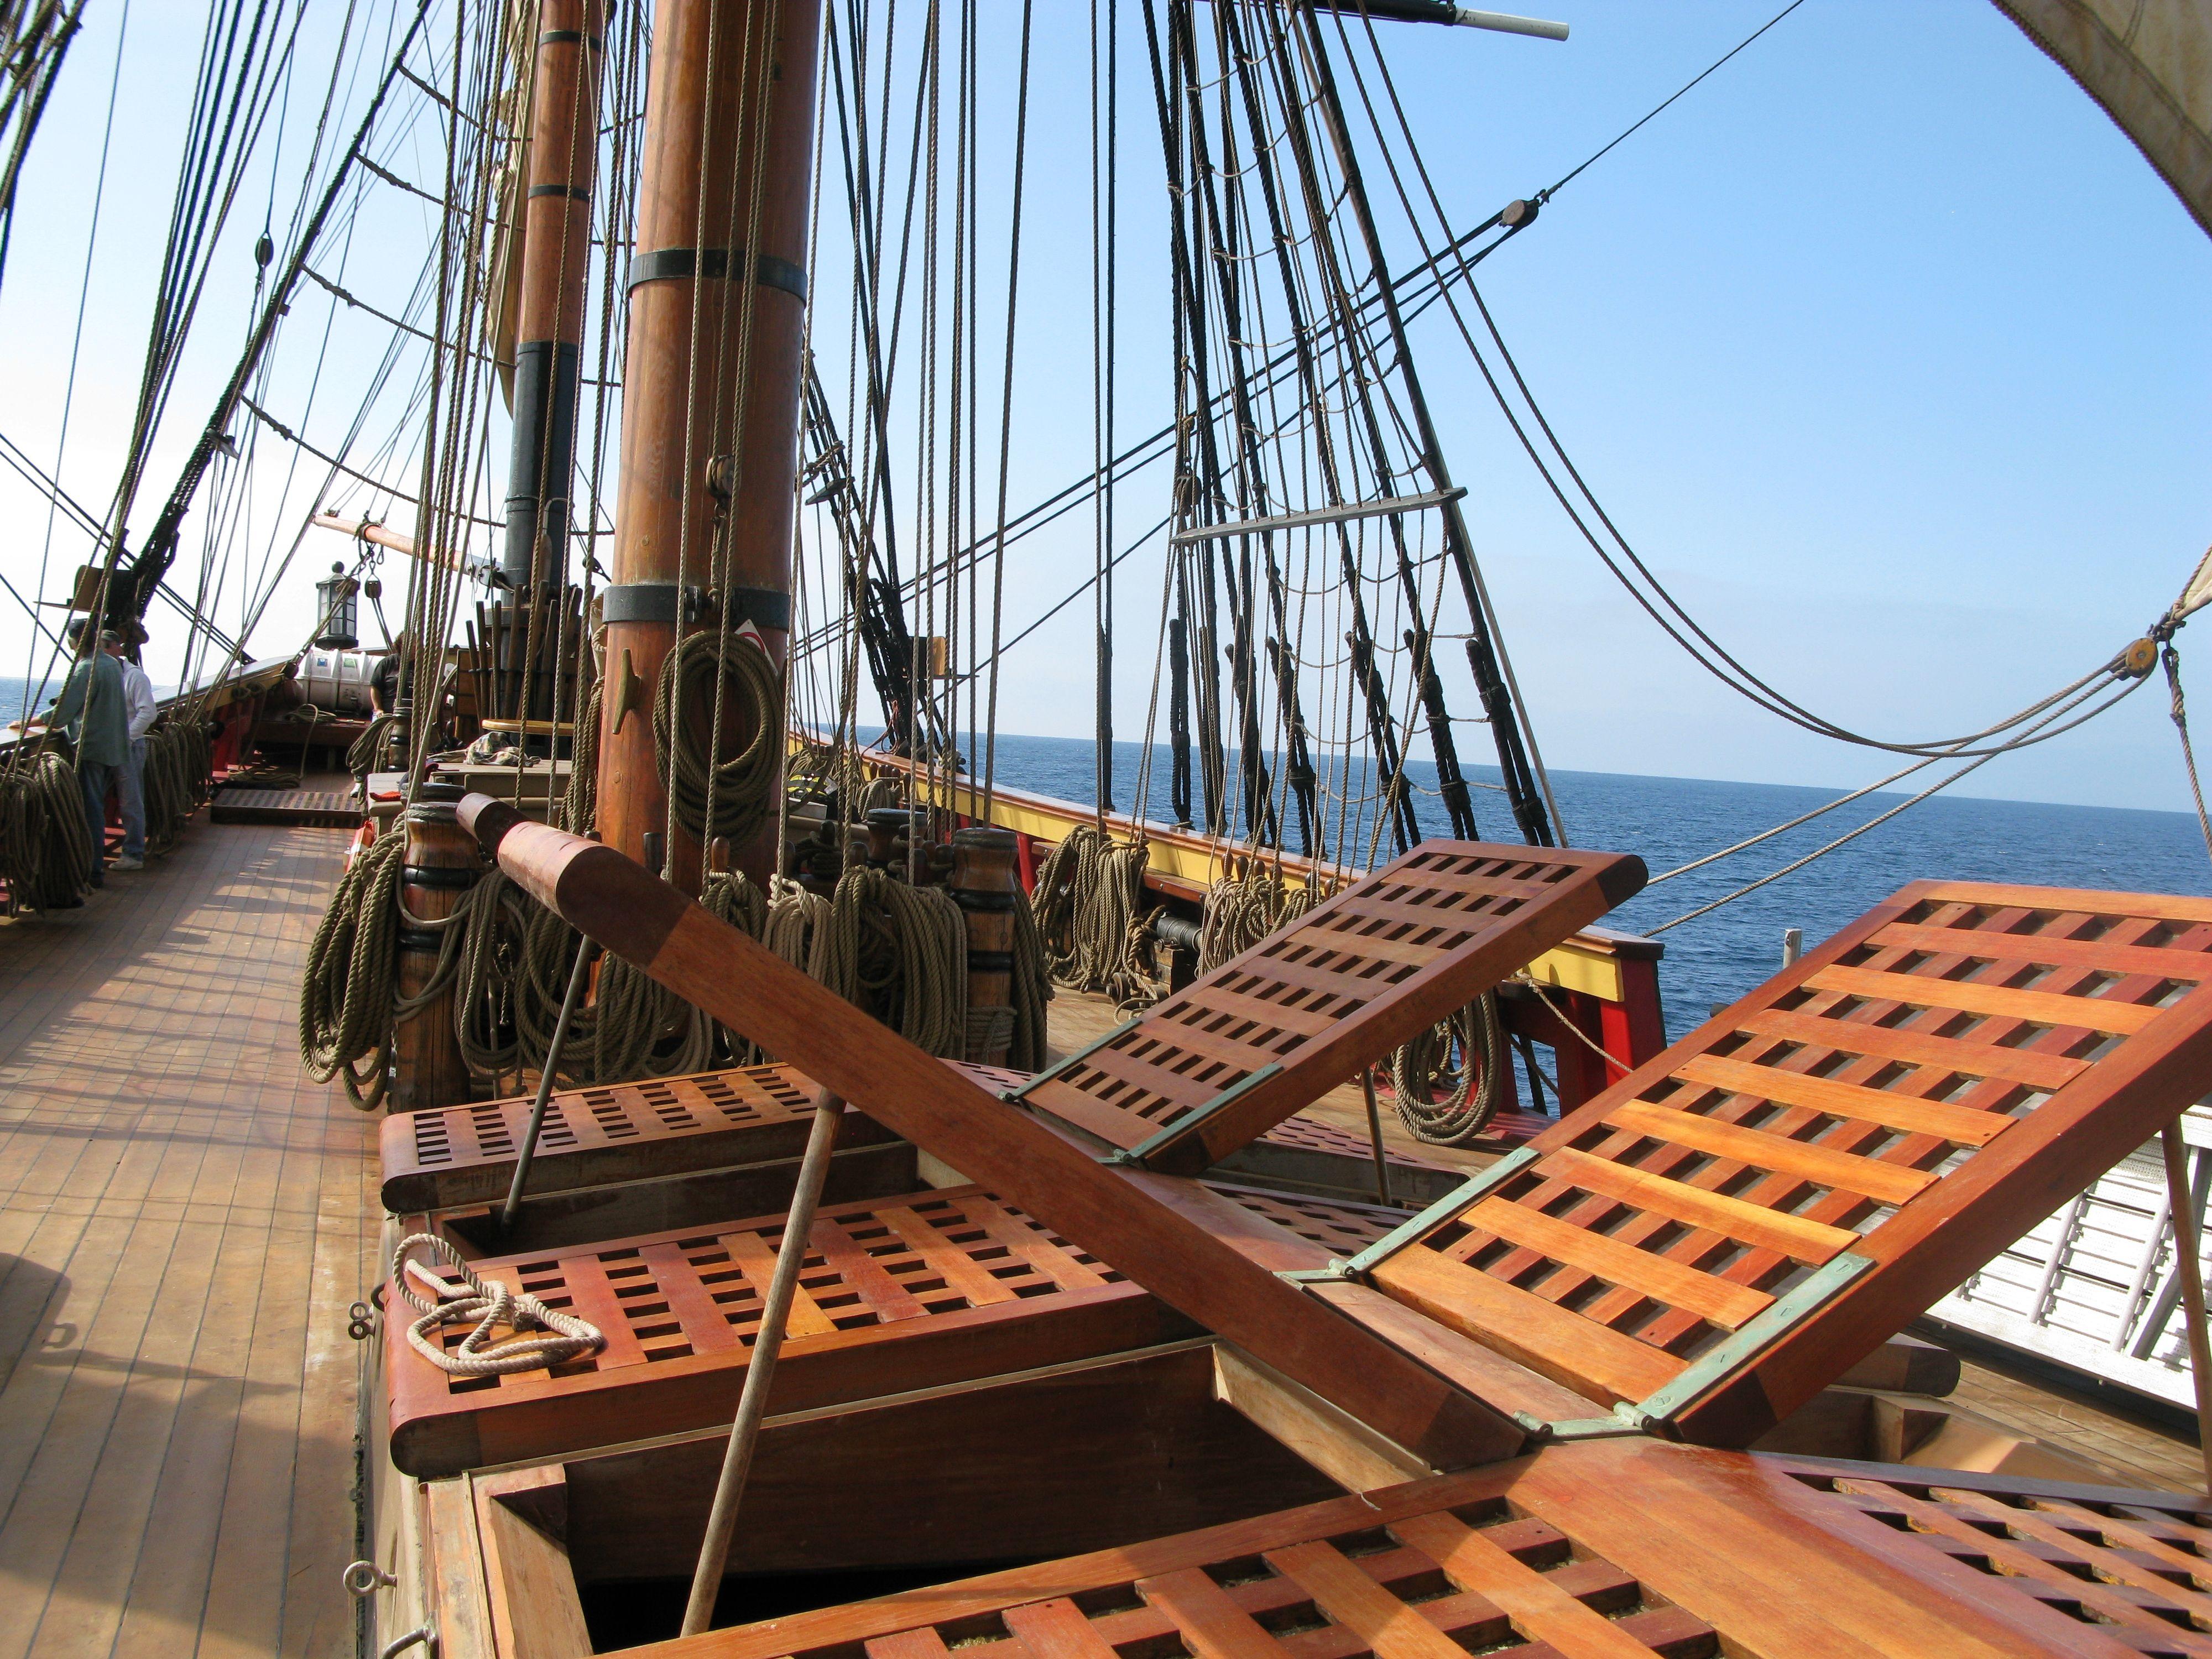 Pirate Ship Upper Deck Google Search Spanish Galleon Pirate